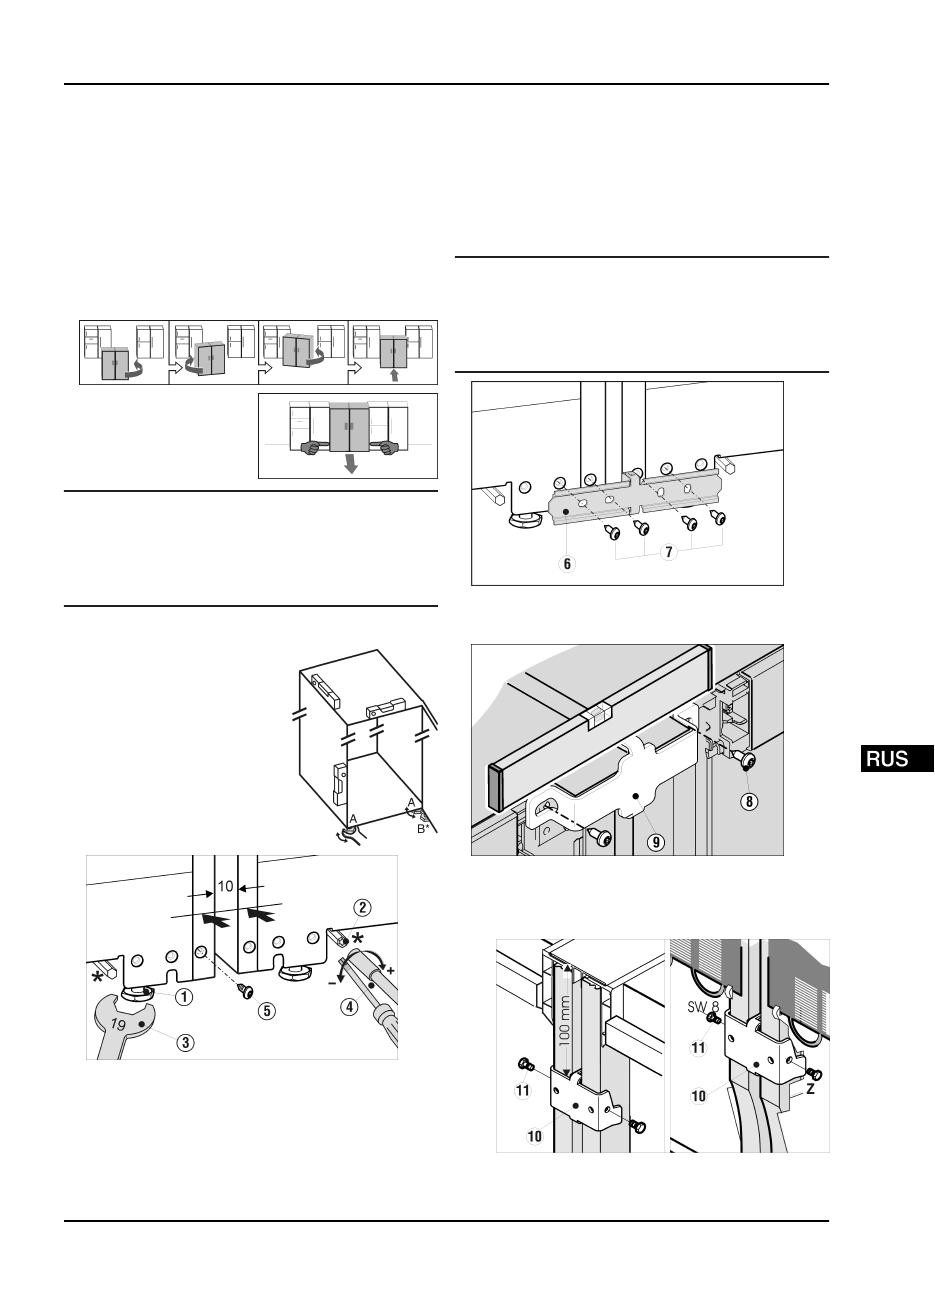 Liebherr sbs 7212 инструкция